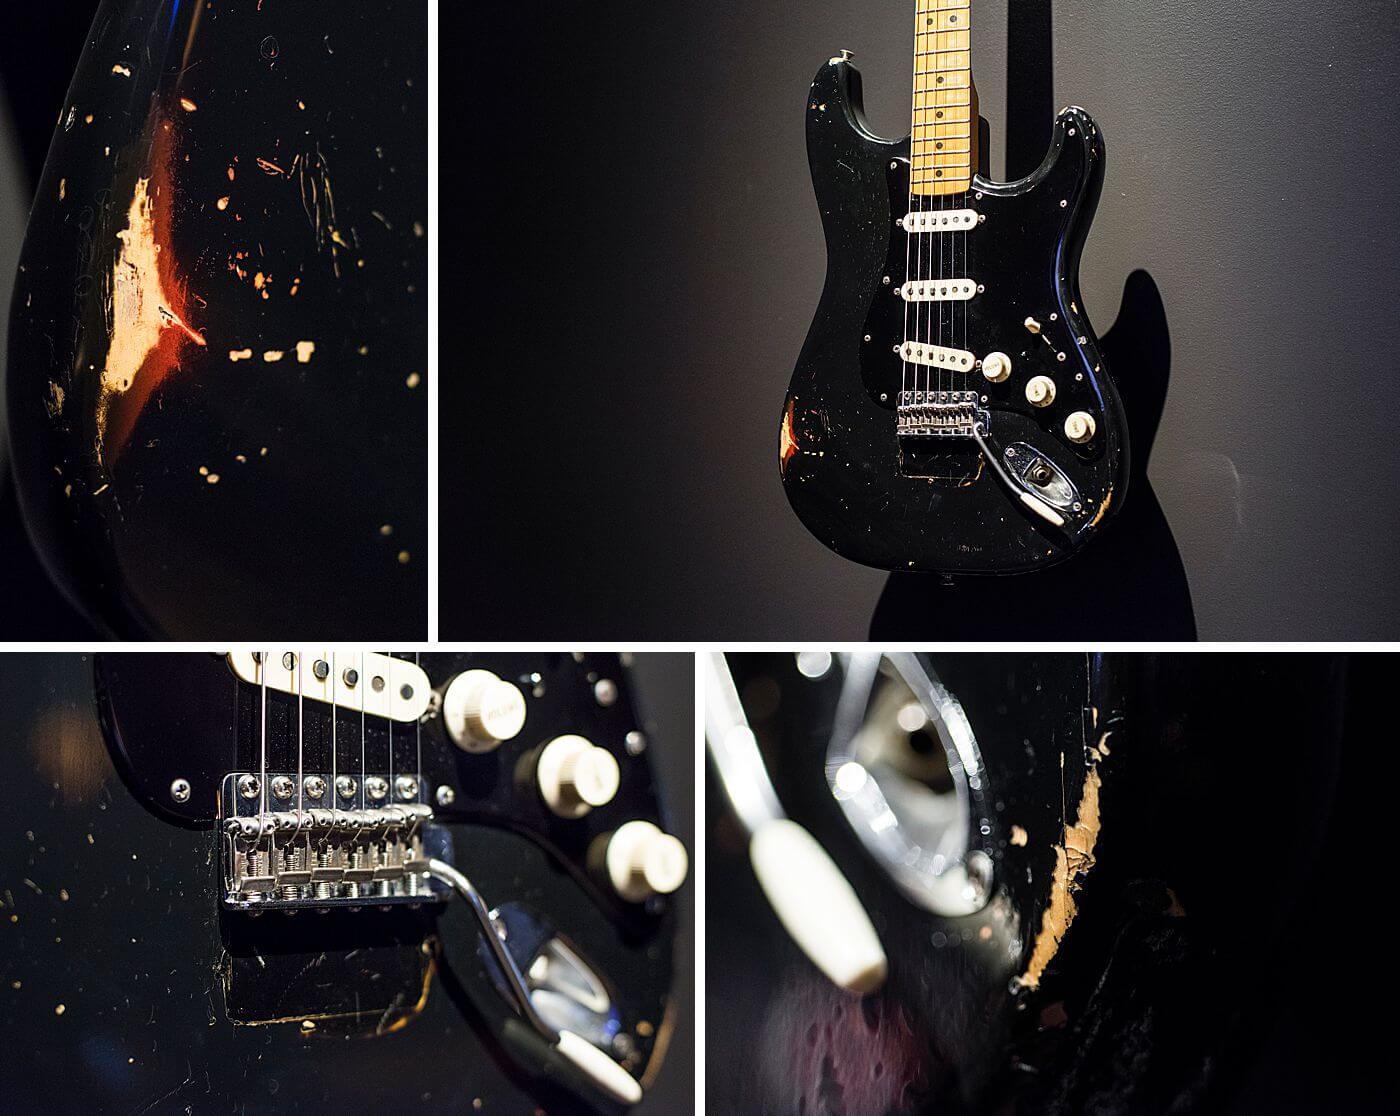 Black Strat Guitar